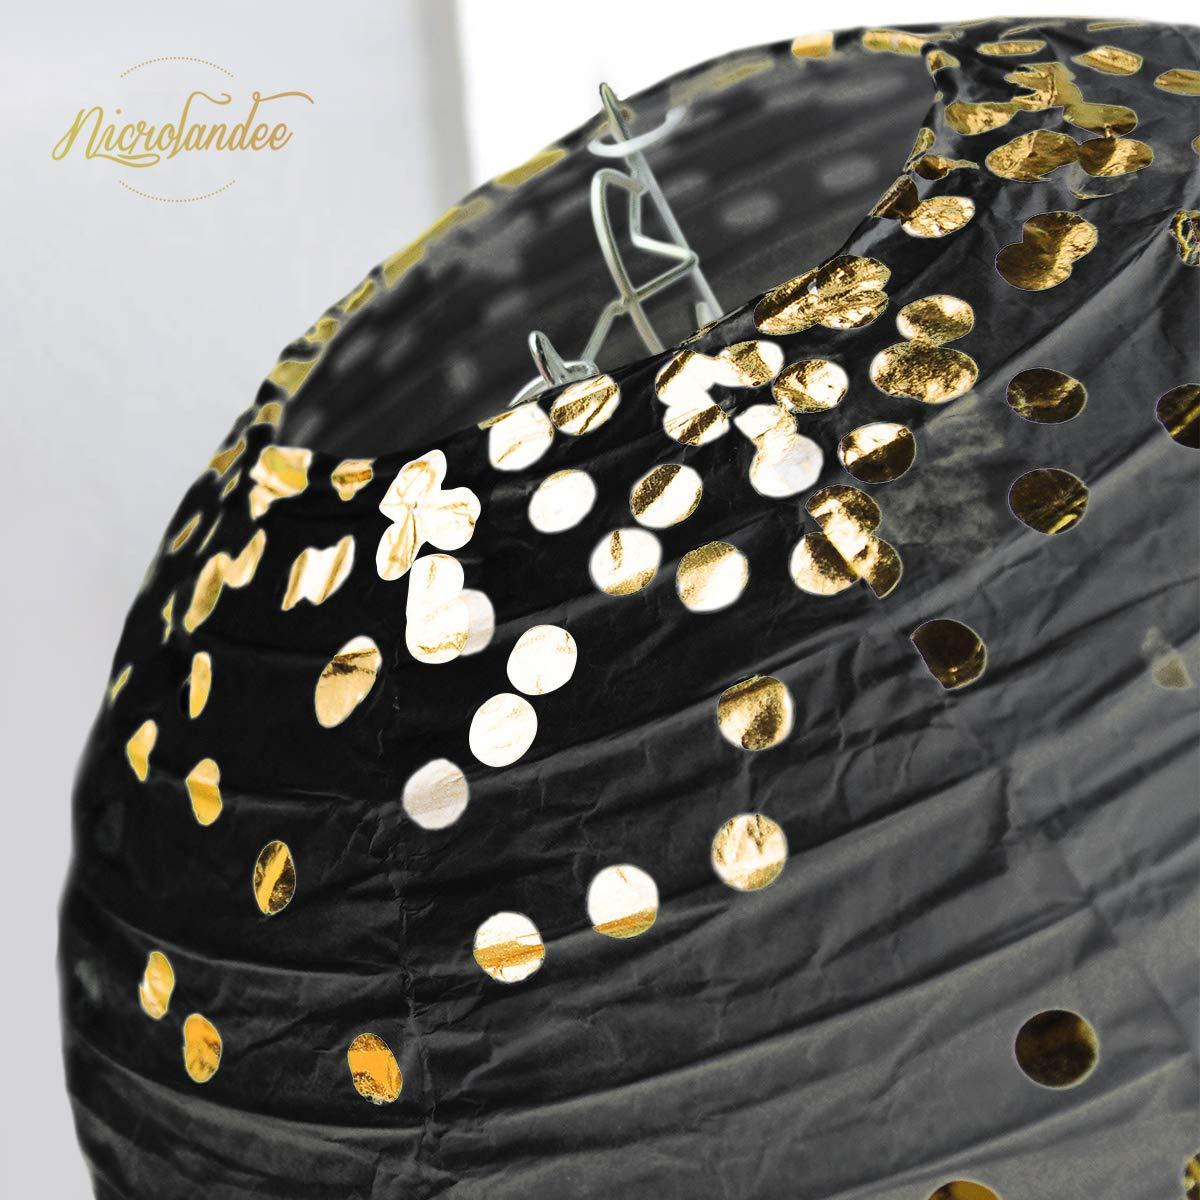 NICROLANDEE Black Gold Metallic Glitter Paper Lantern Decorations with Gold Foil Metallic Fringe Curtains for Graduation Wedding Bridal Shower Hen Bachelorette Birthday Anniversary Backdrop Decor by NICROLANDEE (Image #6)